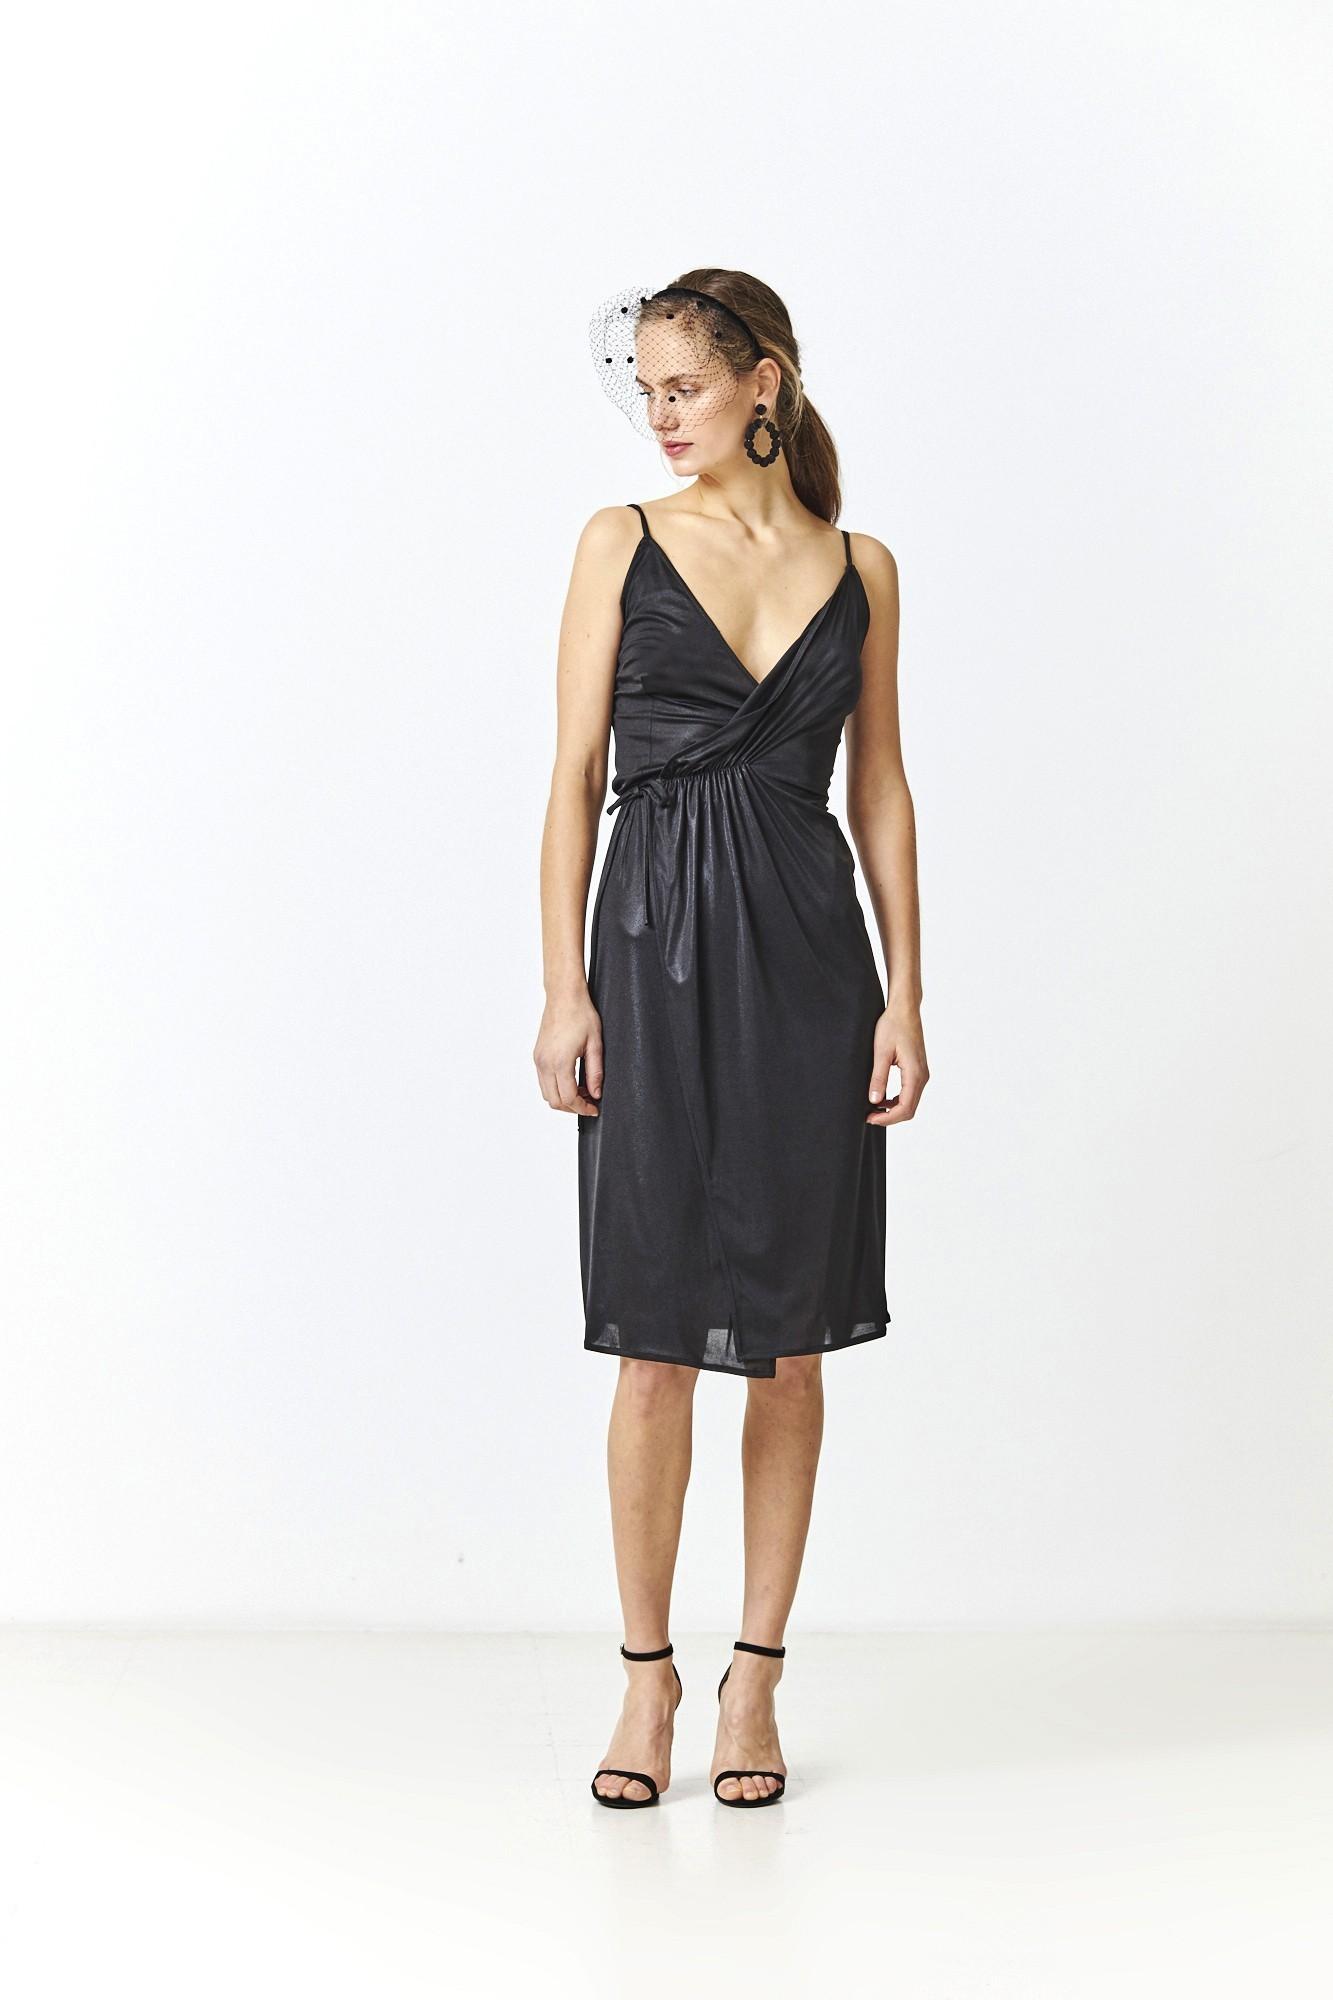 KYLIE BLACK DRESS